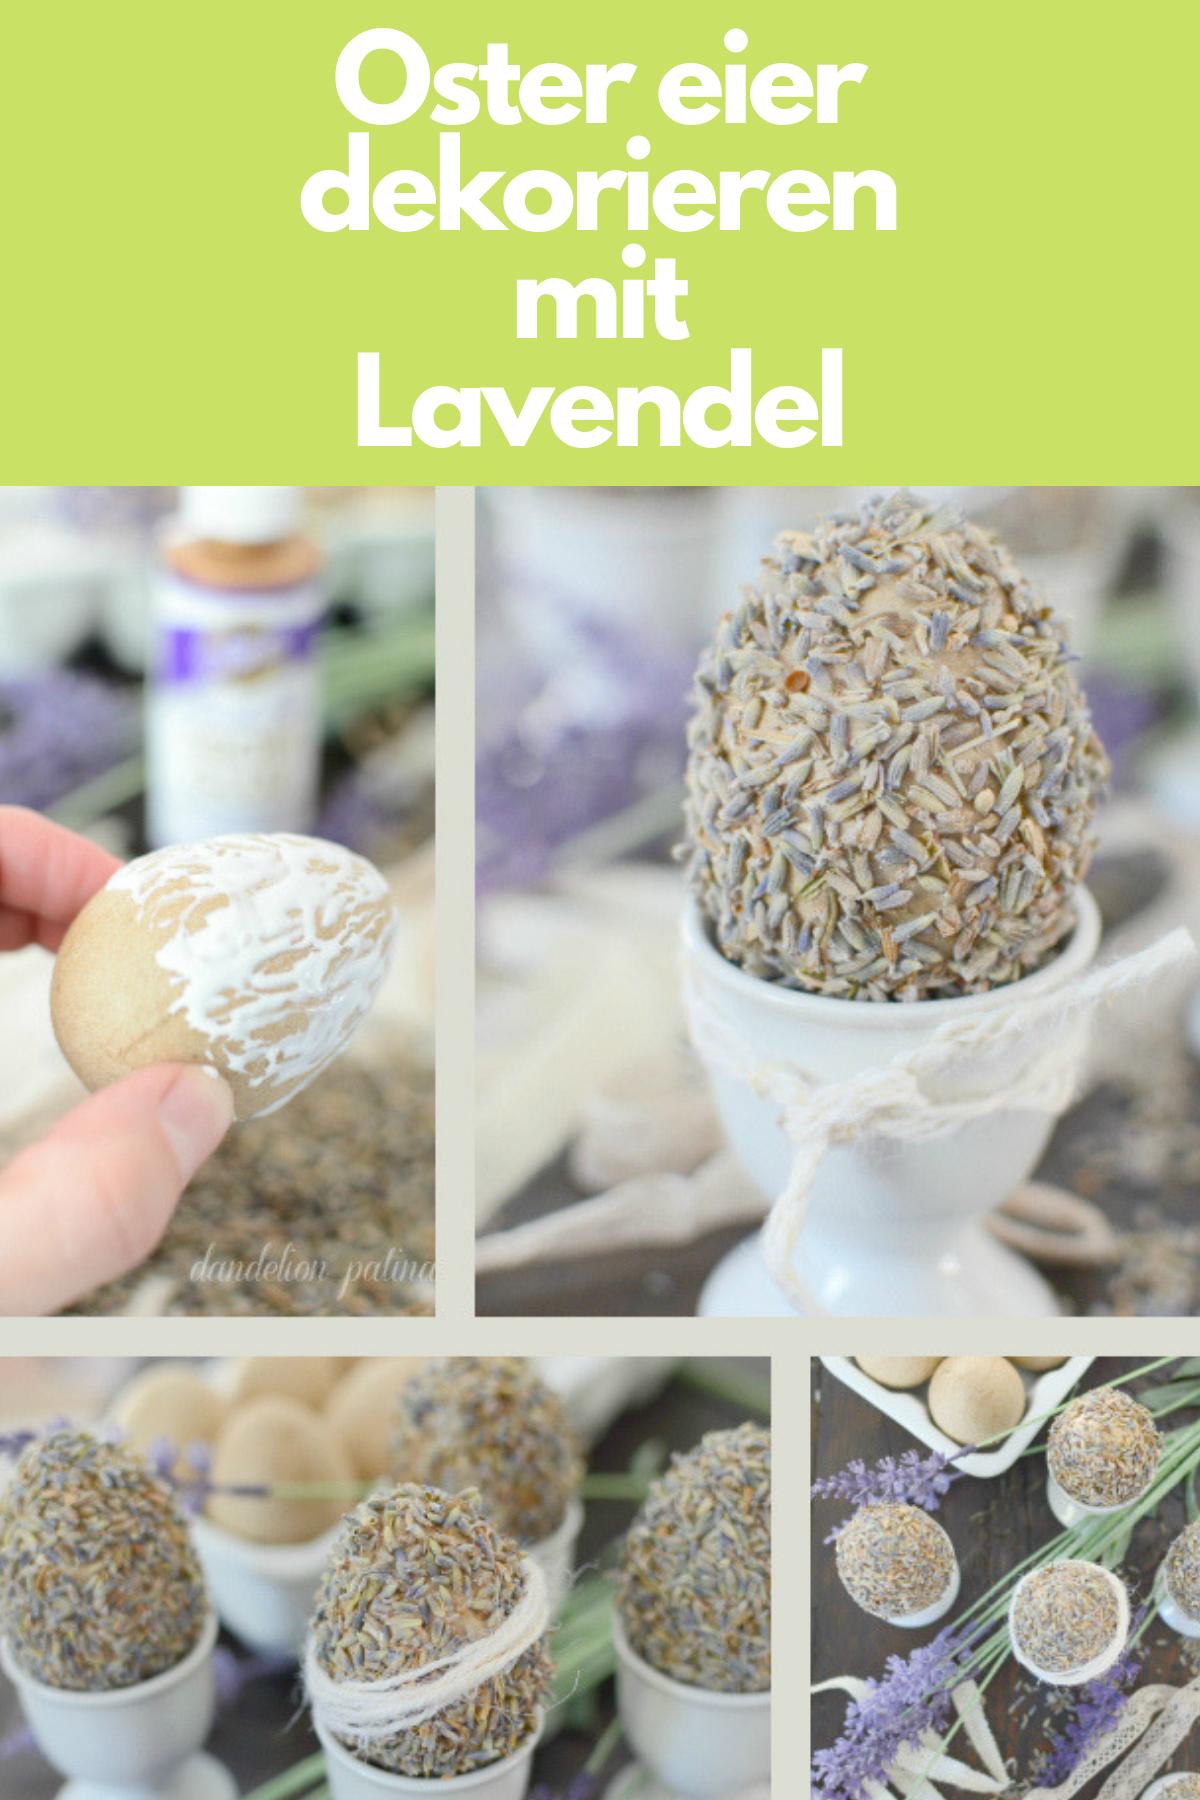 Ostereier dekorieren mi Lavendel